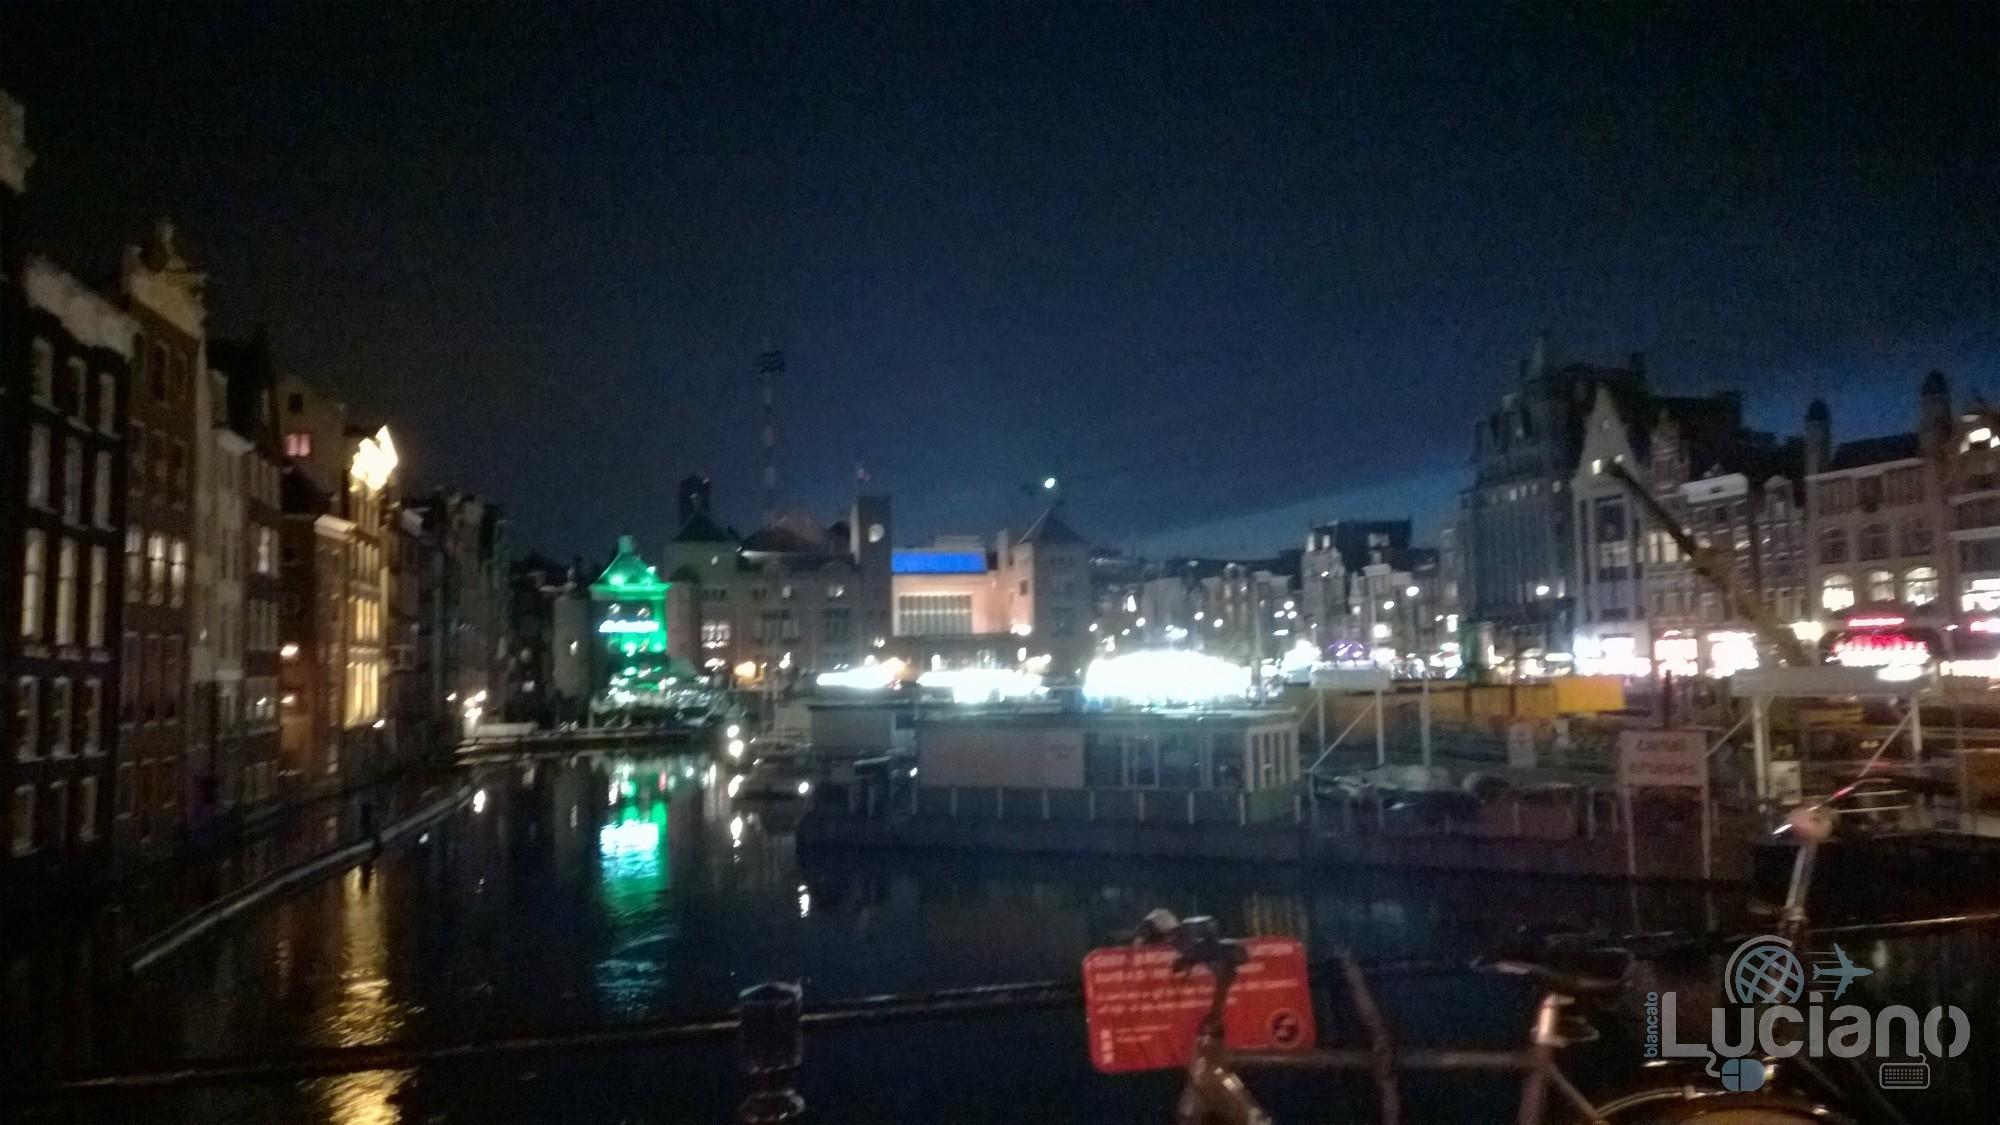 amsterdam-2014-vueling-lucianoblancatoit (67)